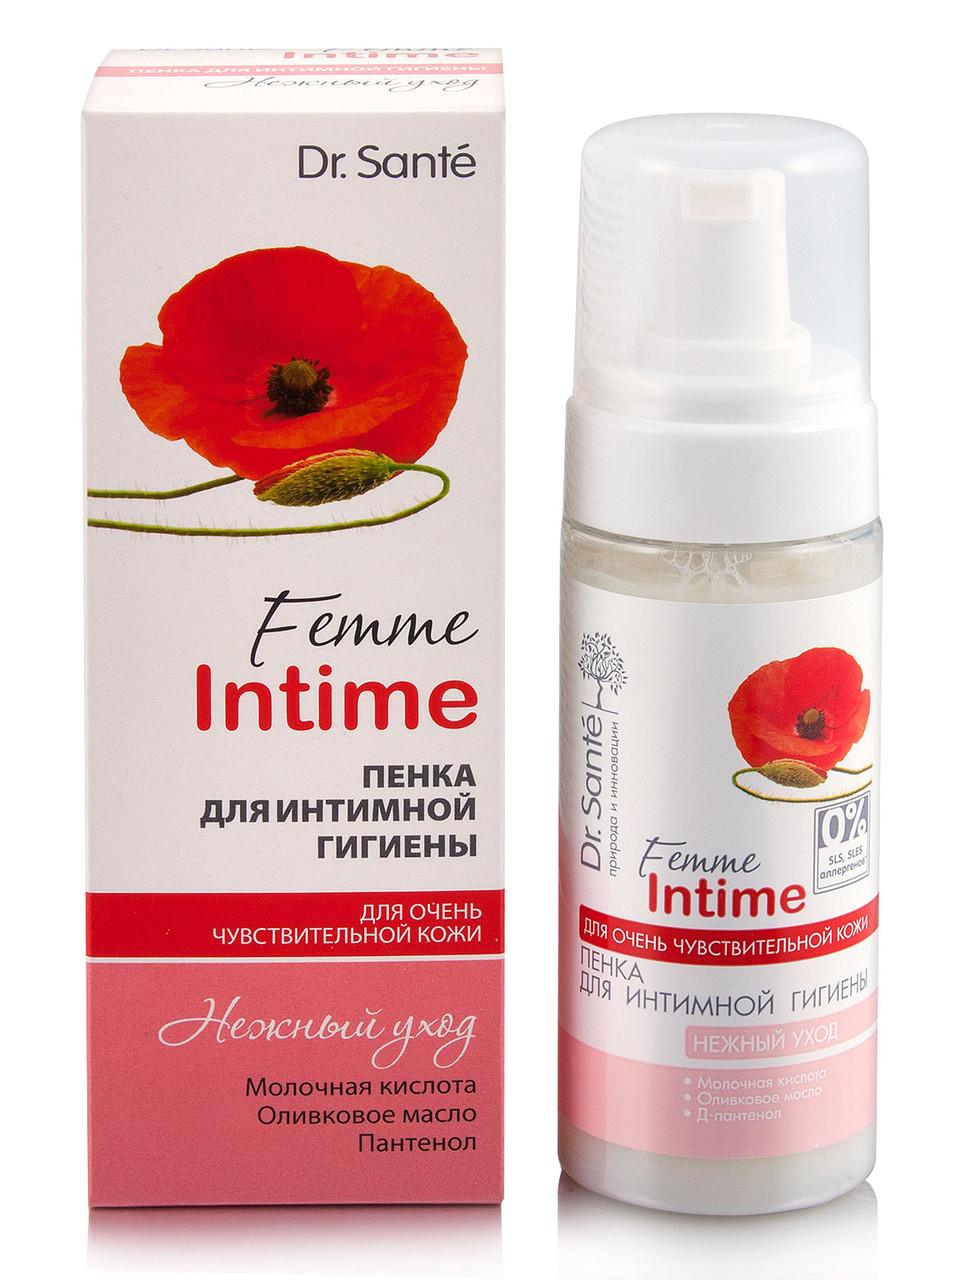 Пенка для интимной гигиены «Нежный уход» Dr.Sante Femme Intime